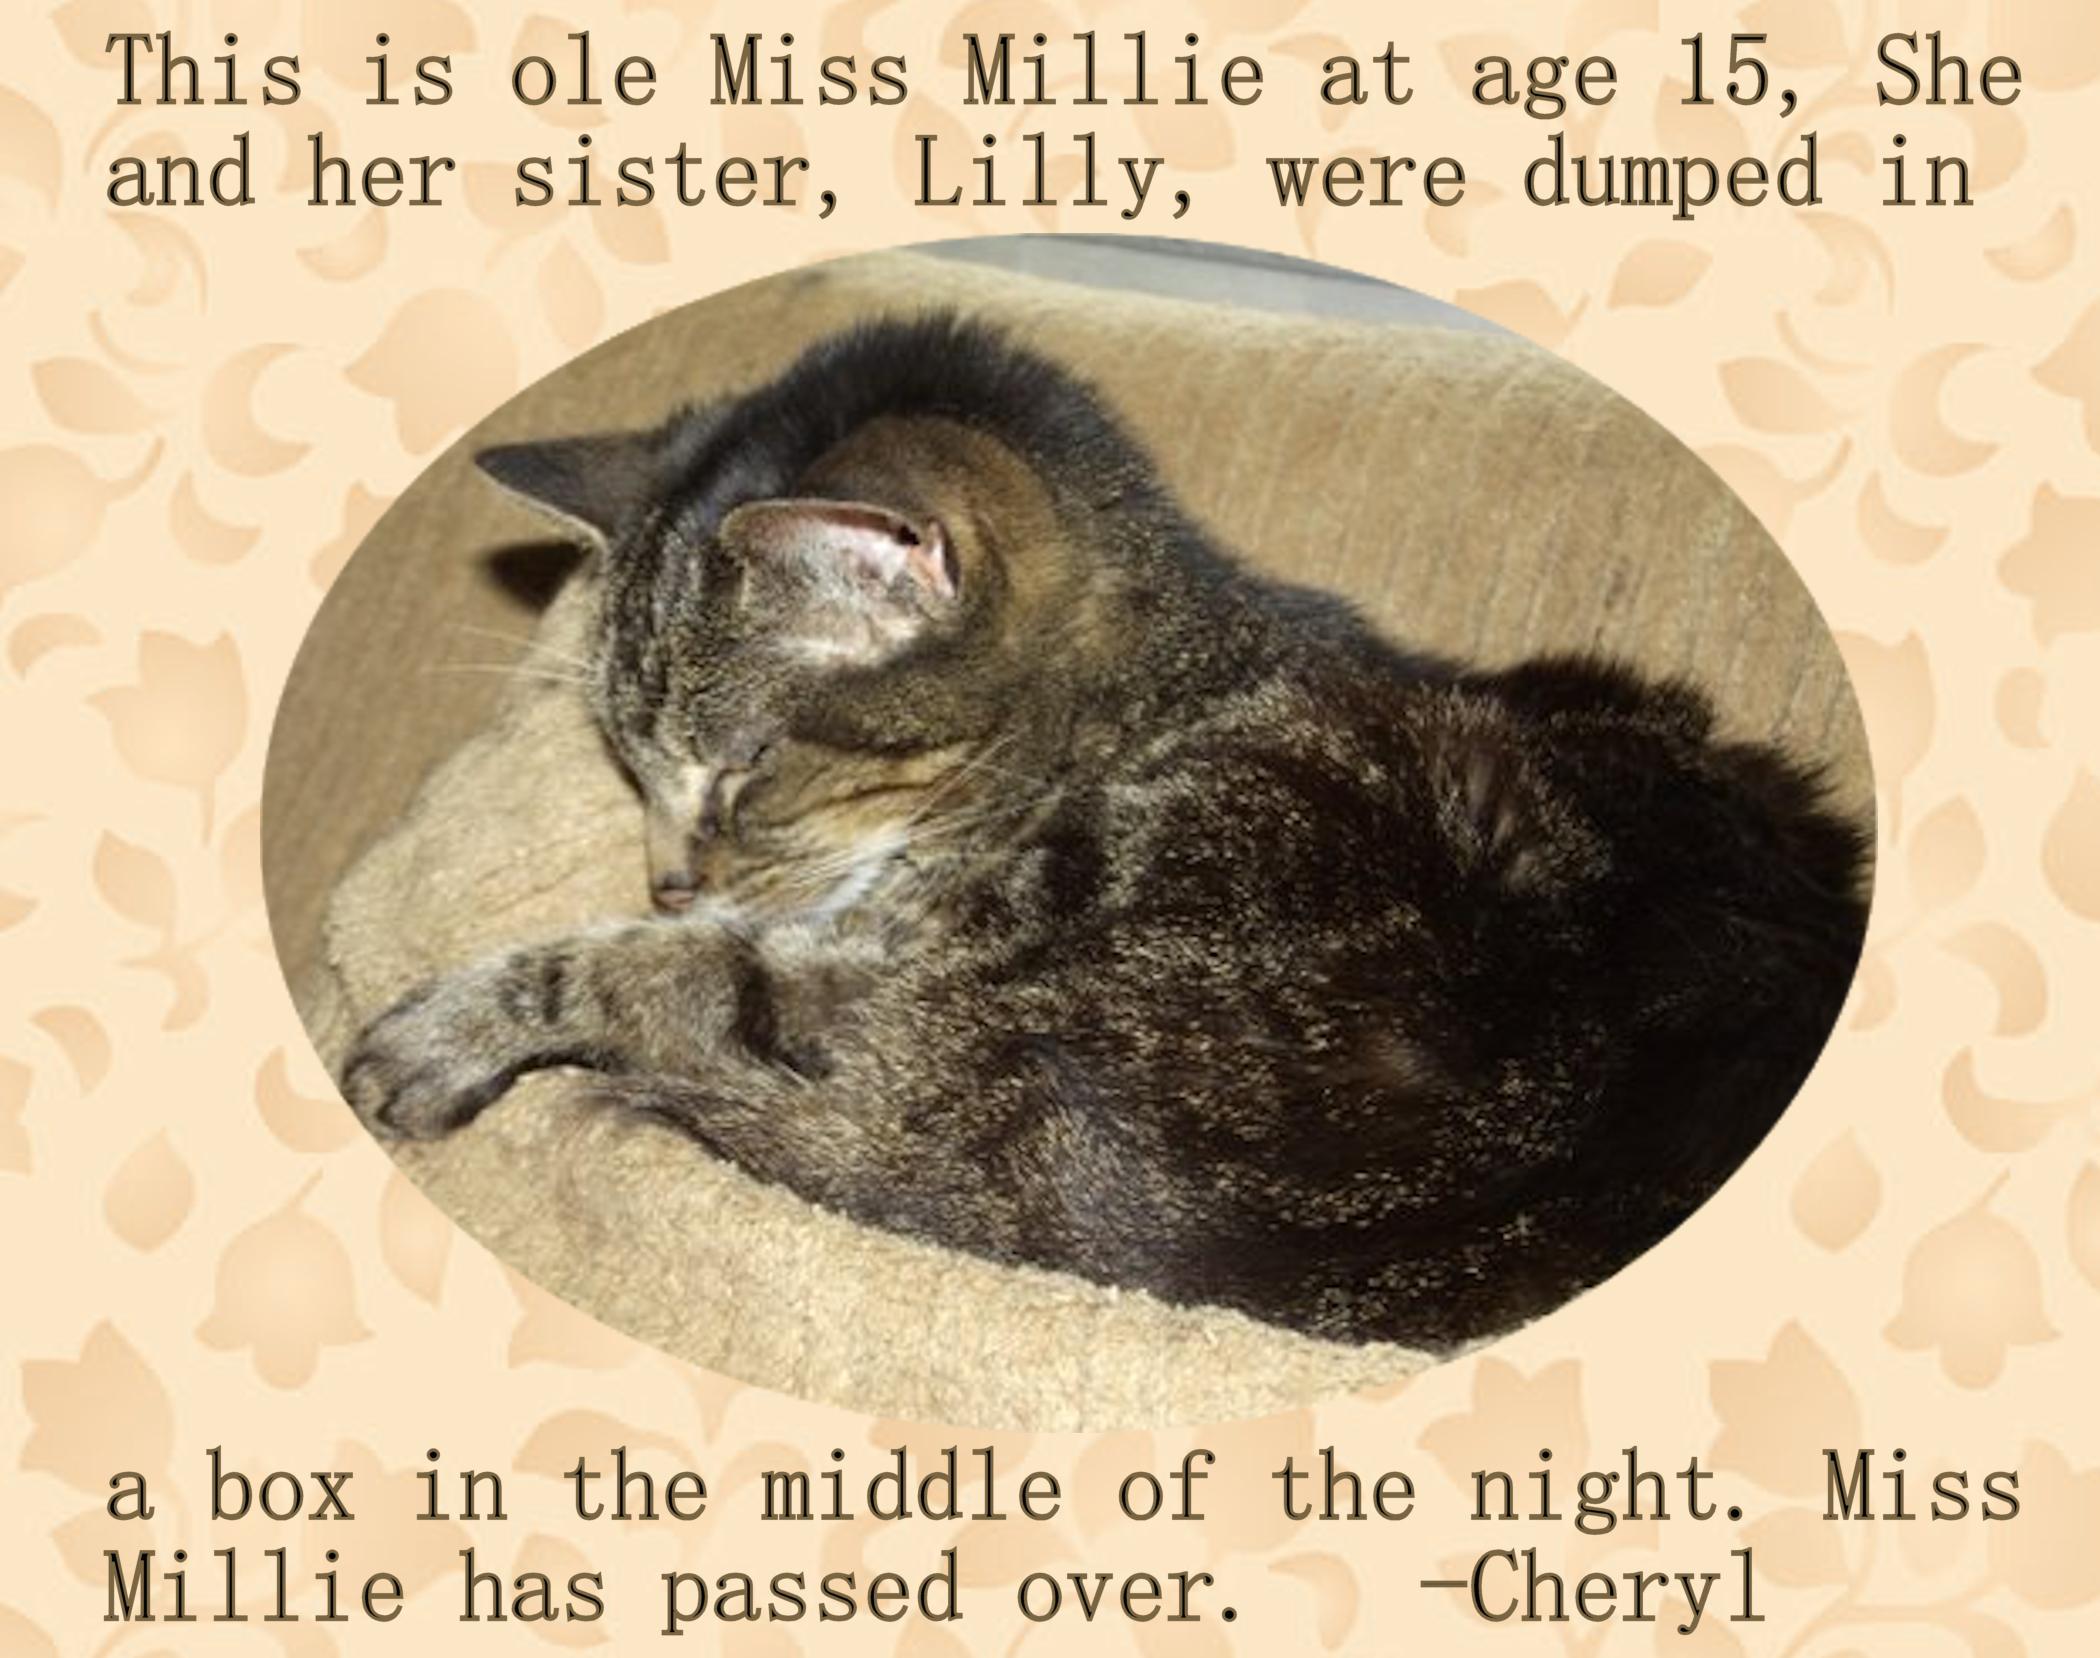 MissMillie